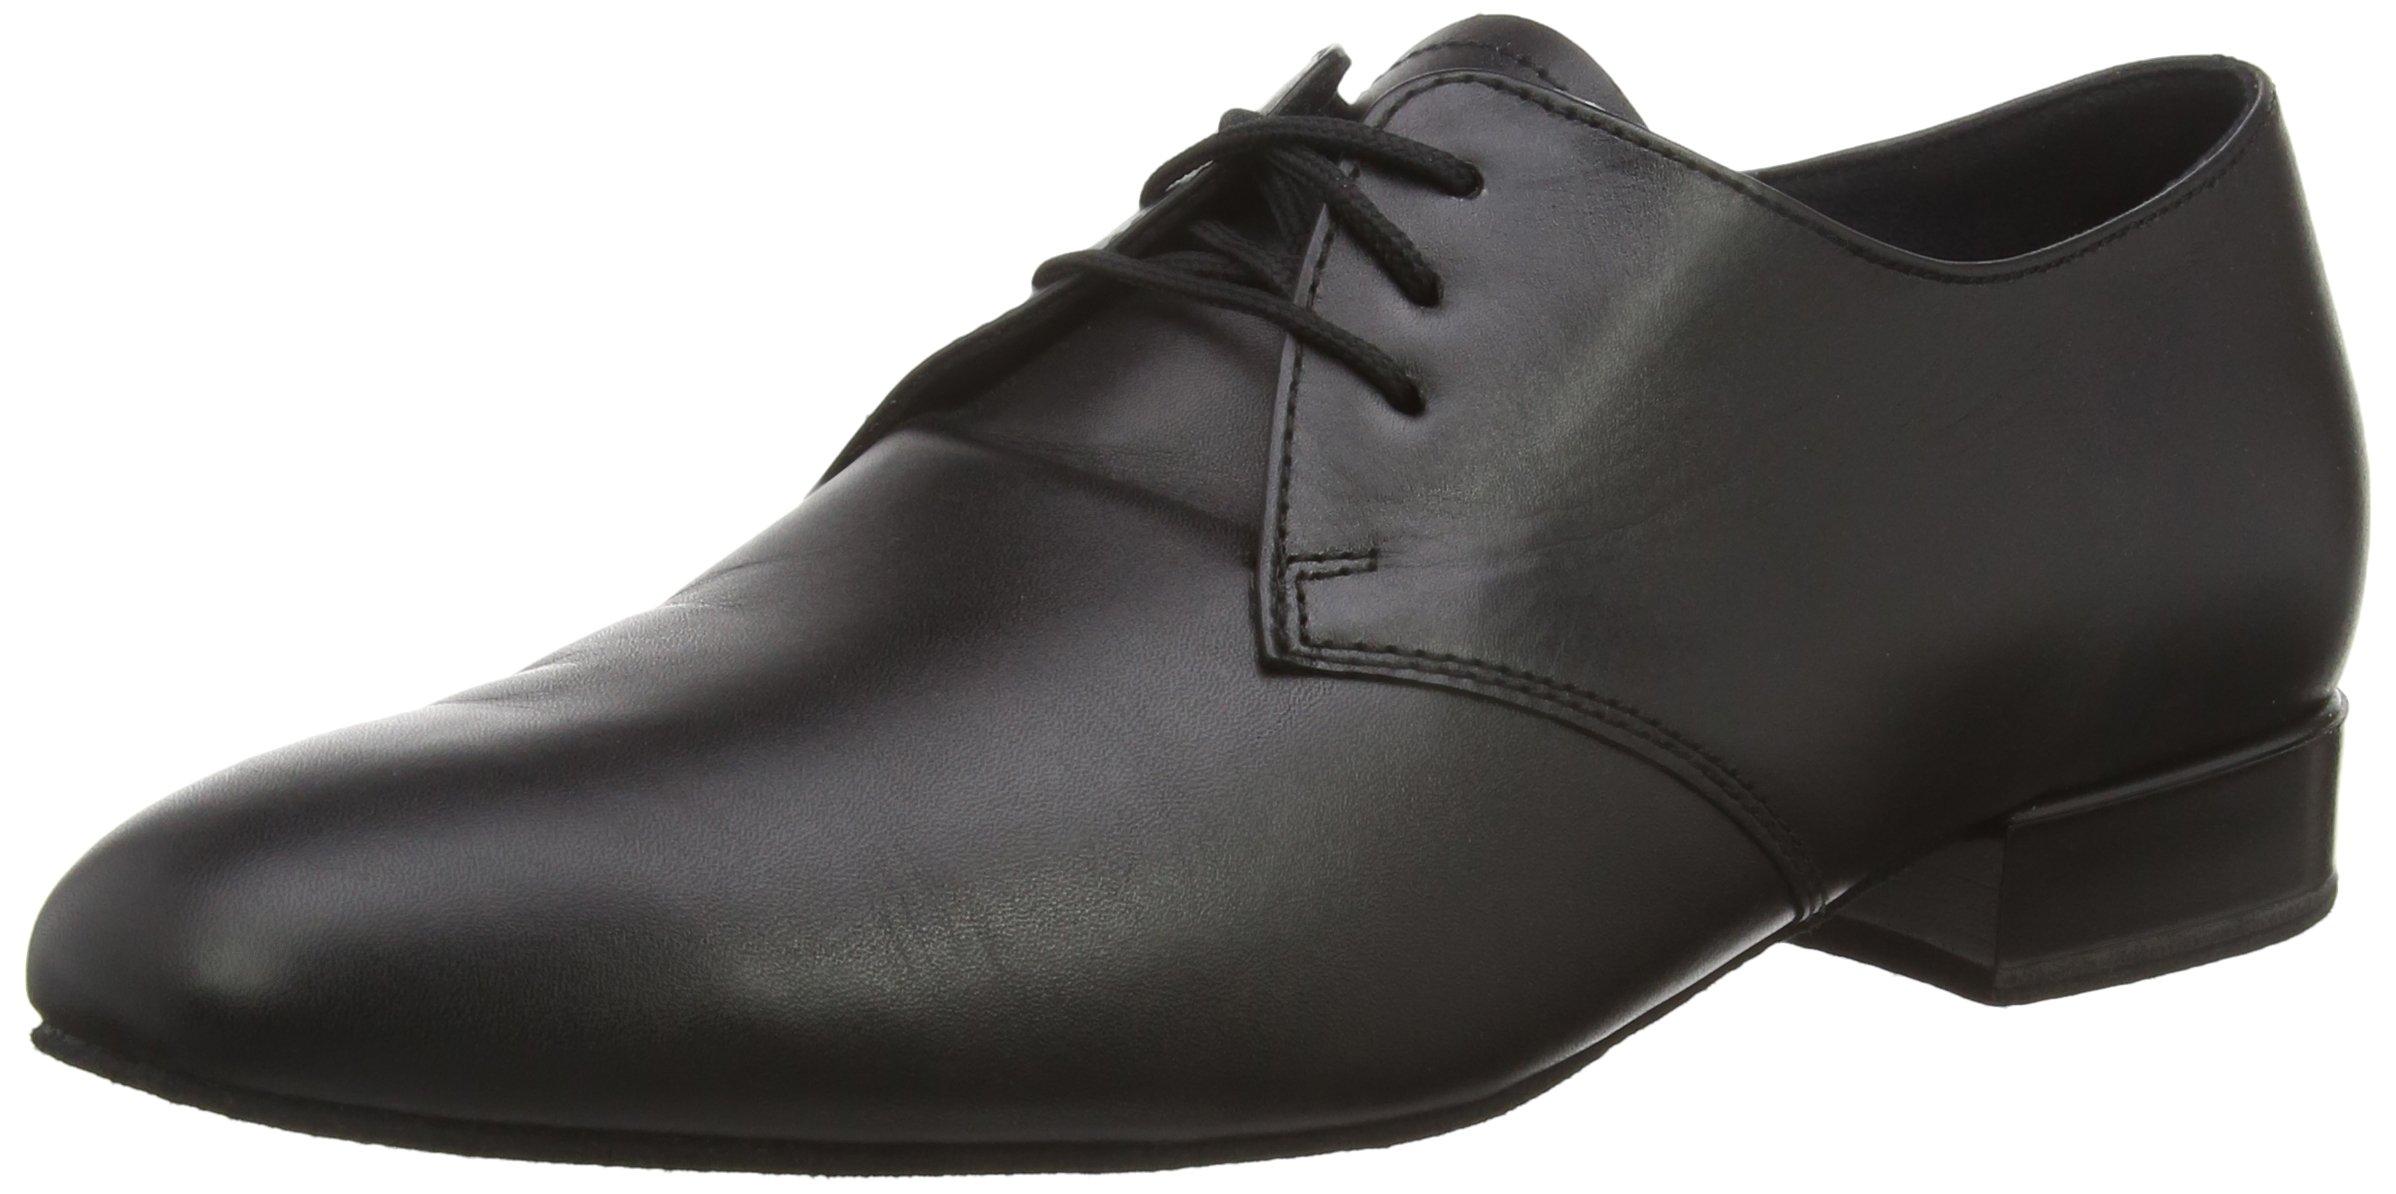 Diamant Men's Model 095 - 3/4'' (2 cm) Standard Shoe for Tango/Salsa, 9.5 M US (9 UK)